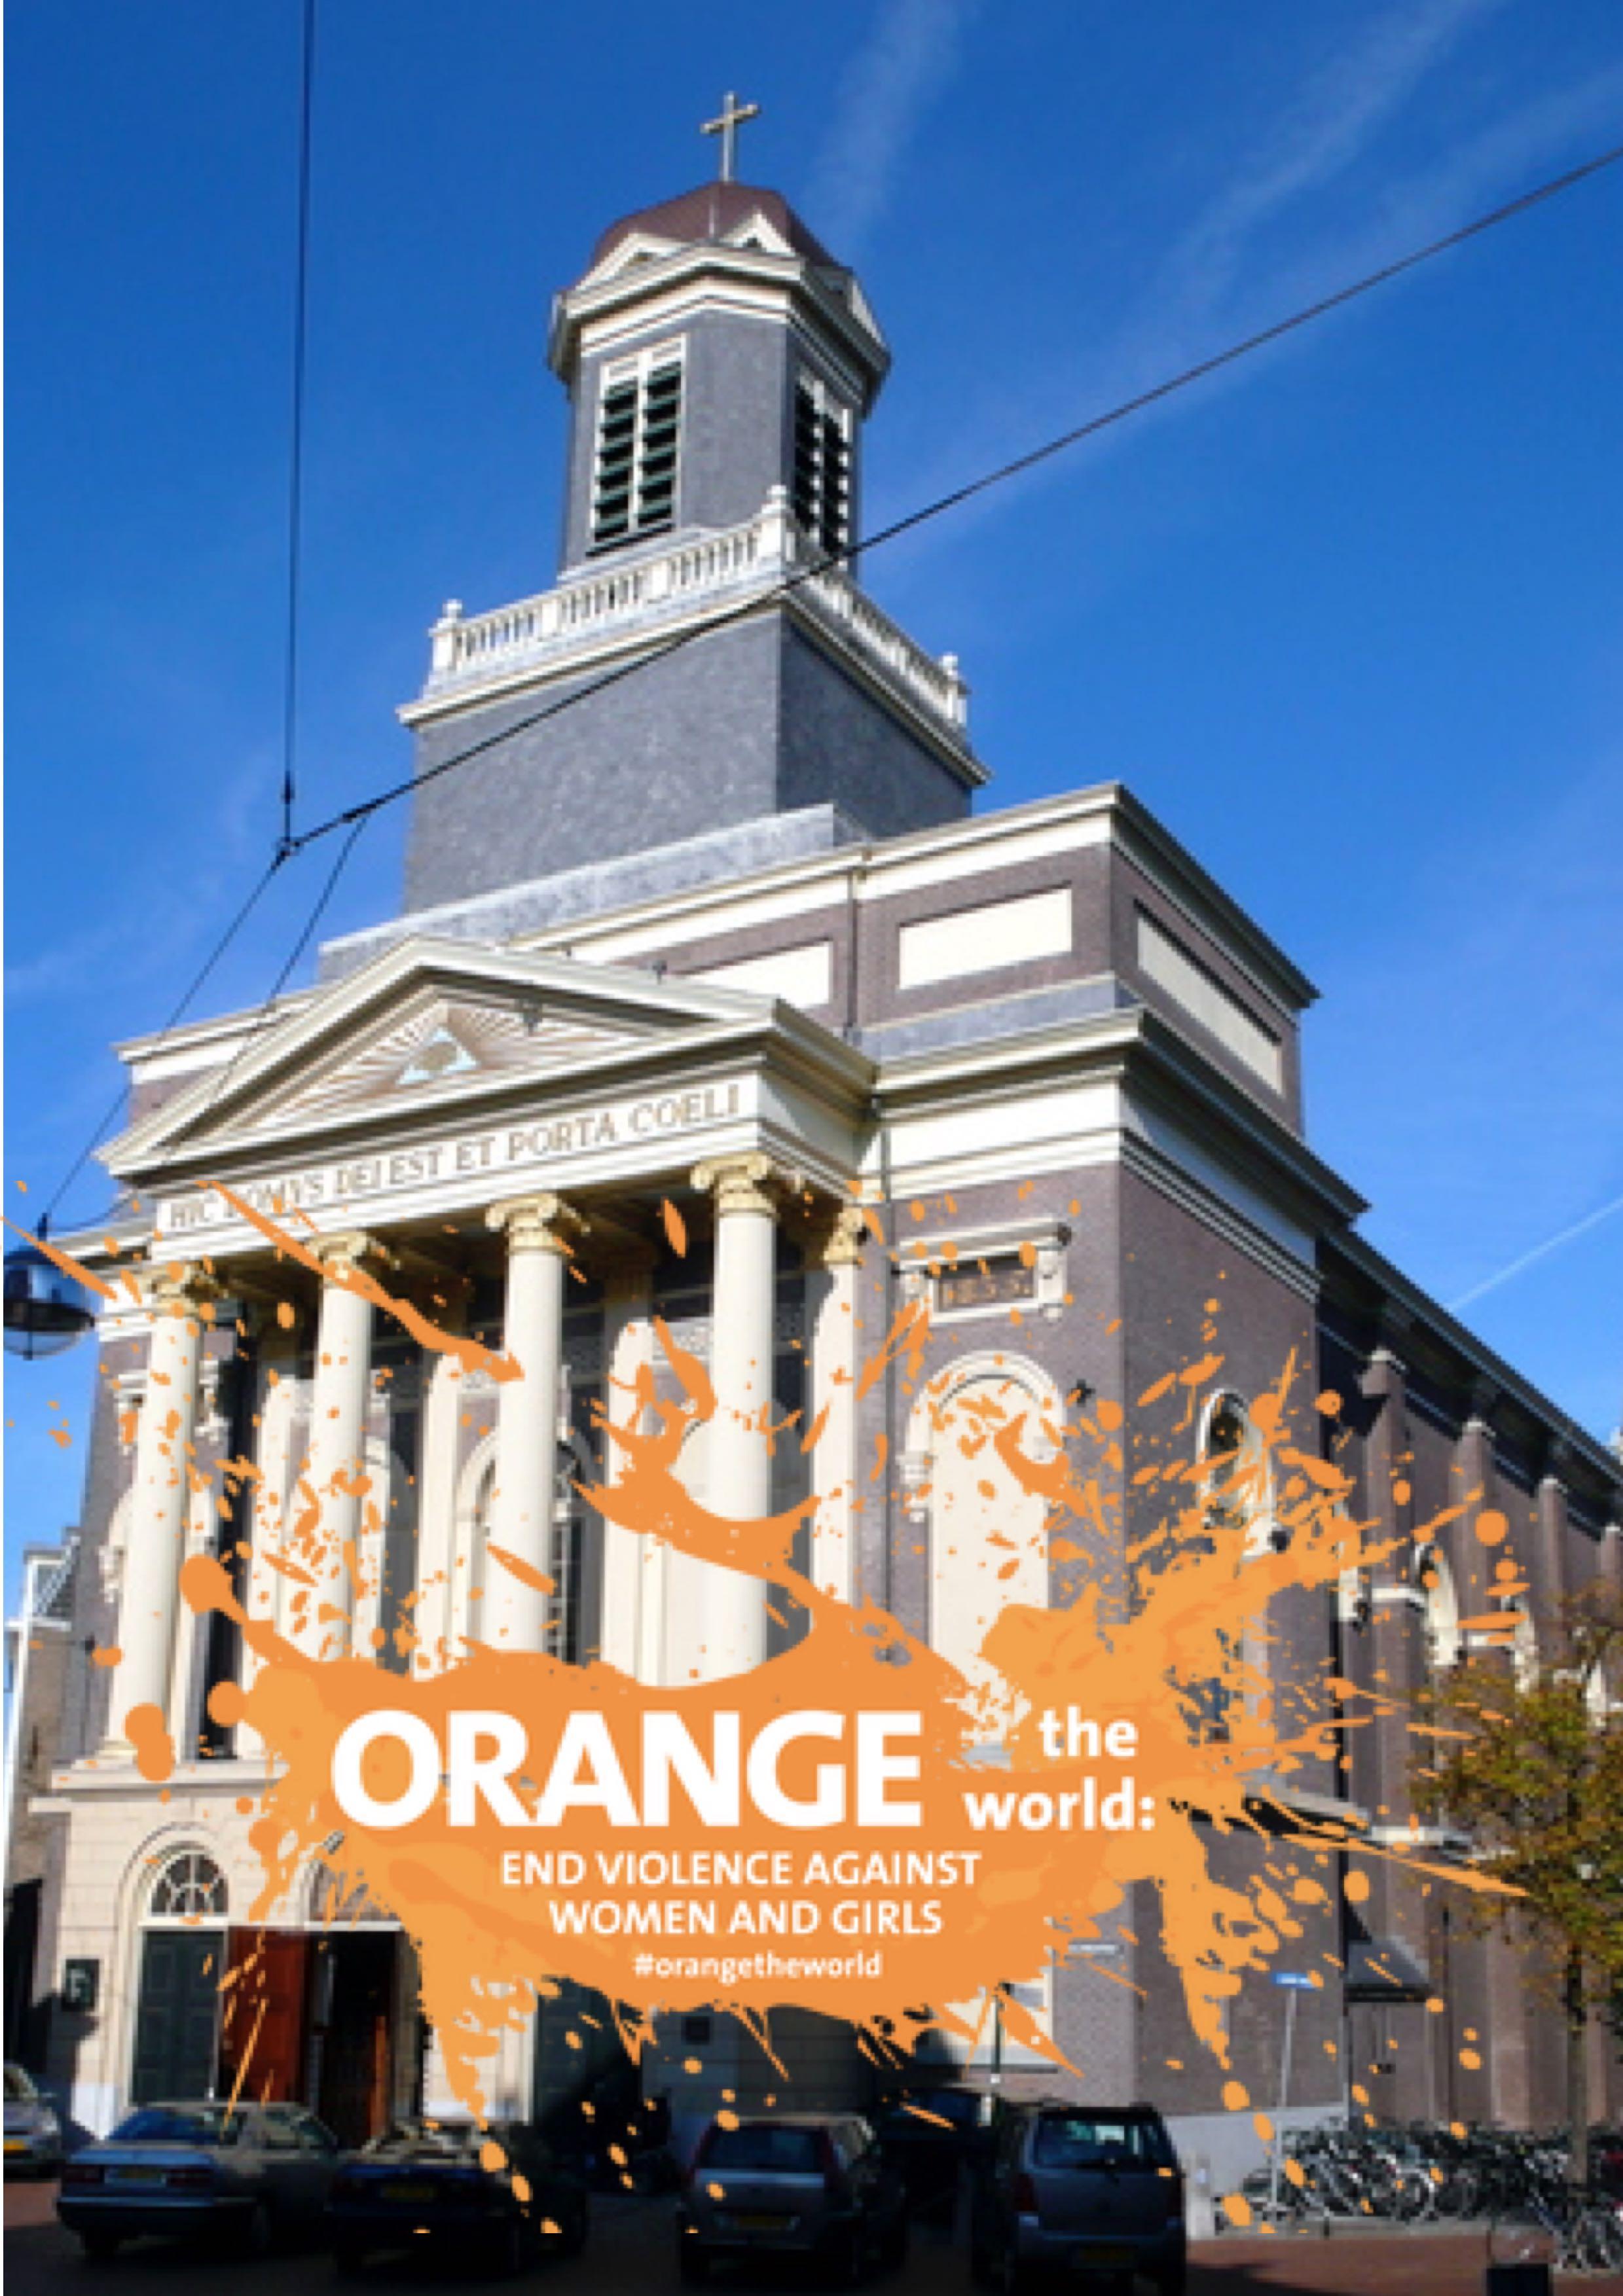 leiden; Zonta en orange the world